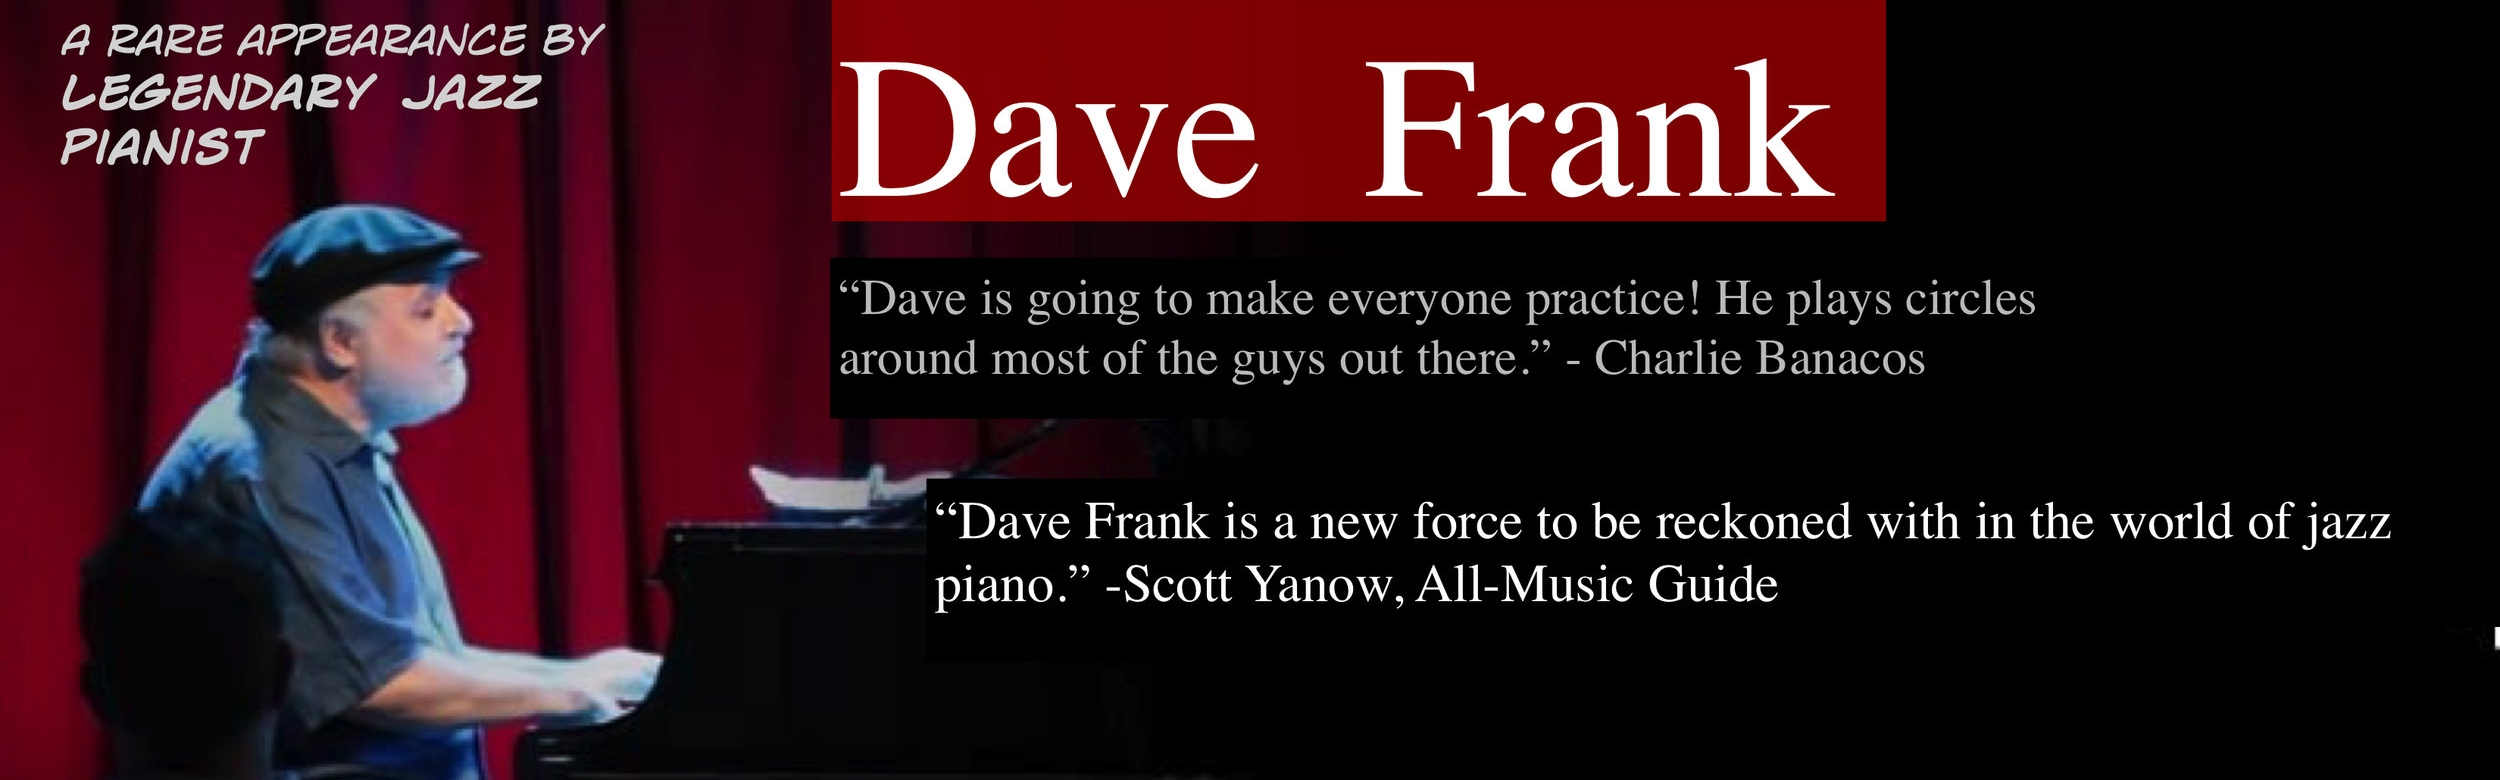 Dave Frank-Lilypad-larger.jpg